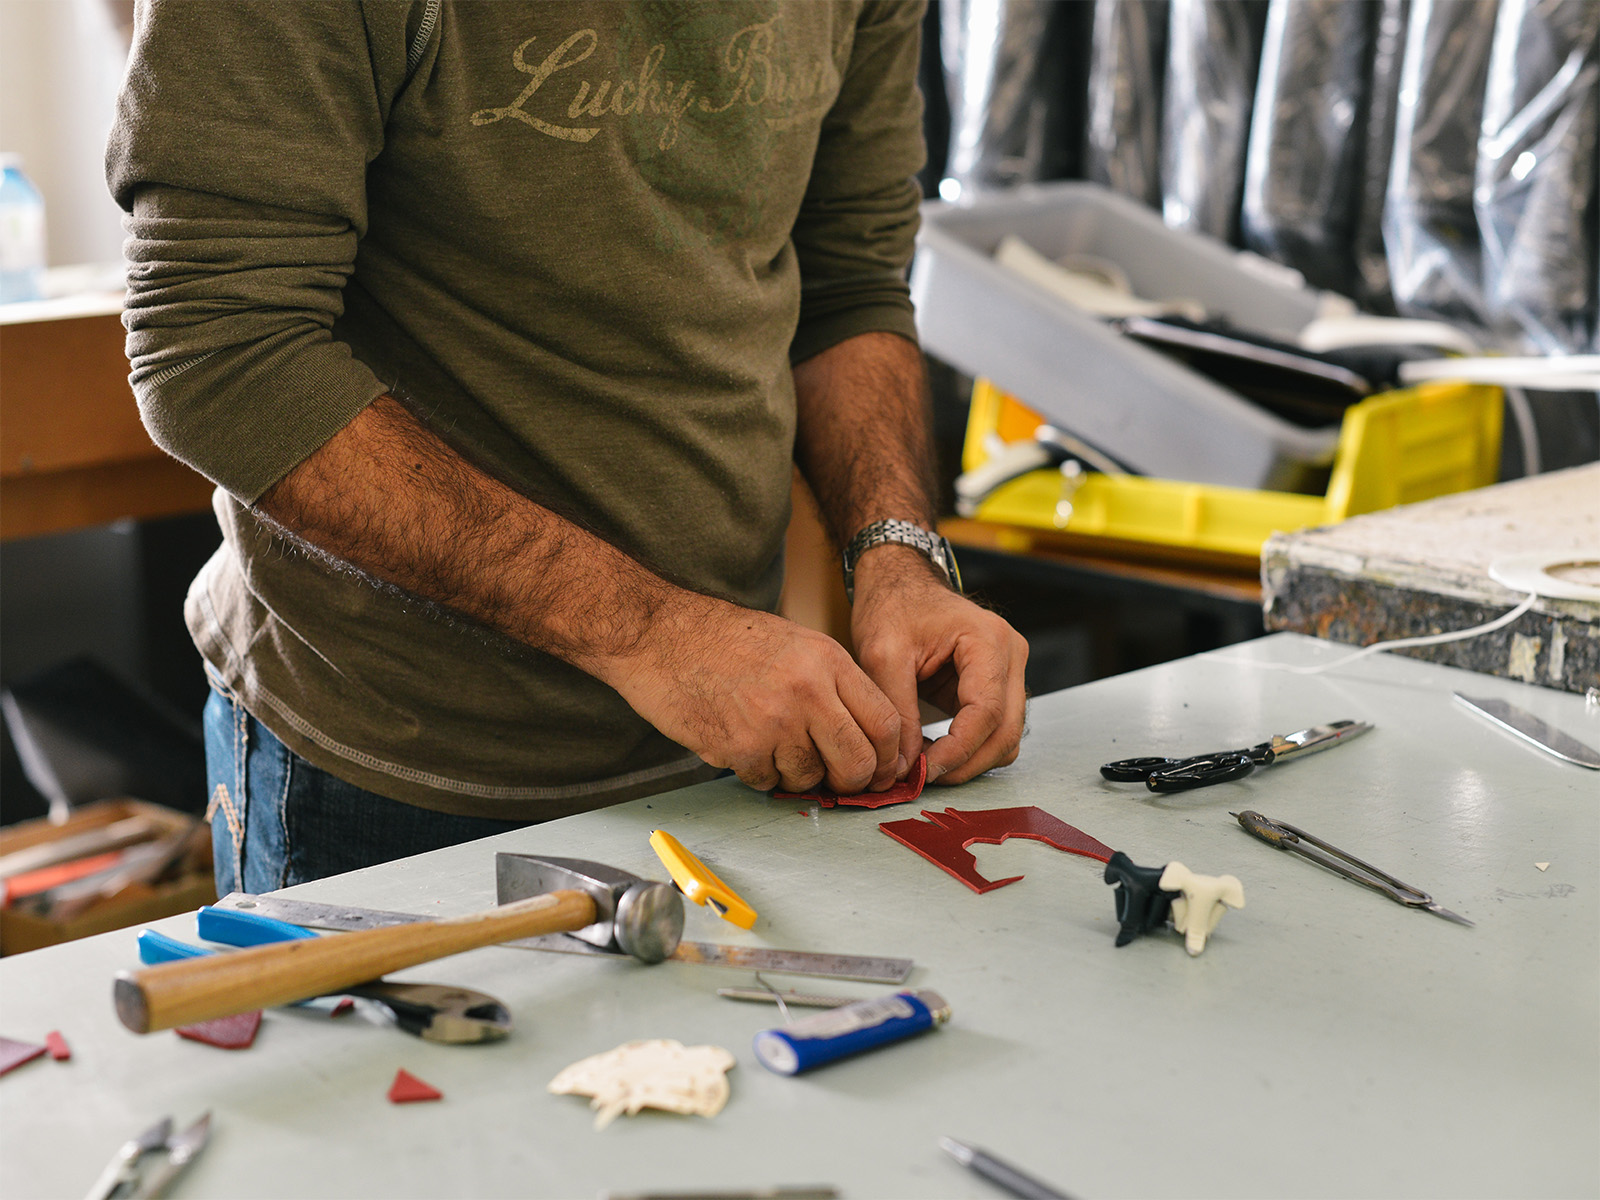 Handyman services in London, woodwork, electrics, kitchen appliances assembling, lighting, plumbing, wallpapering, switch installs